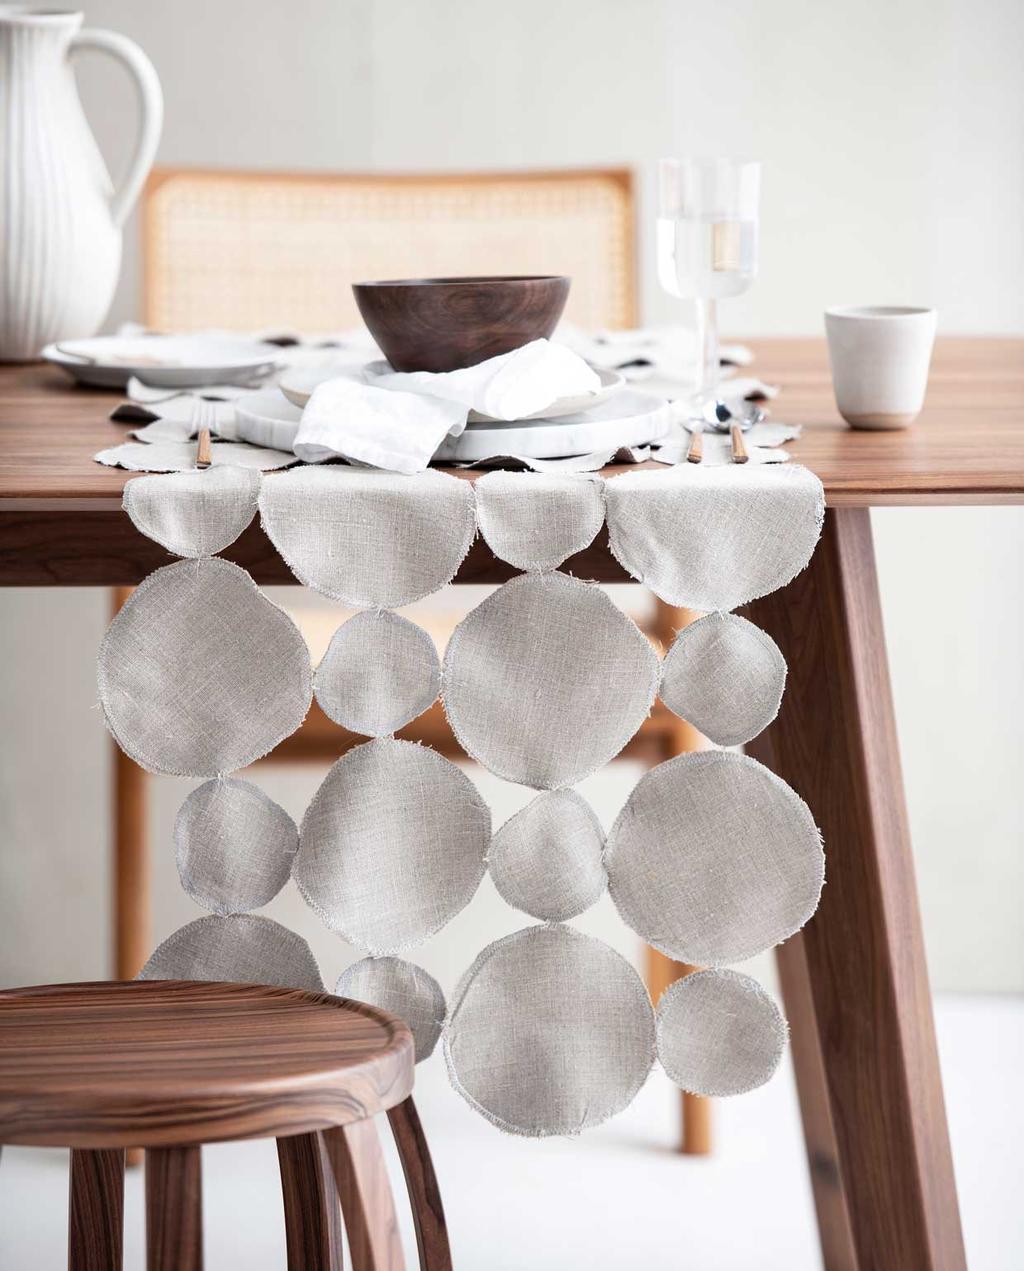 vtwonen 06-2020 | DIY tafelloper op gedekte tafel